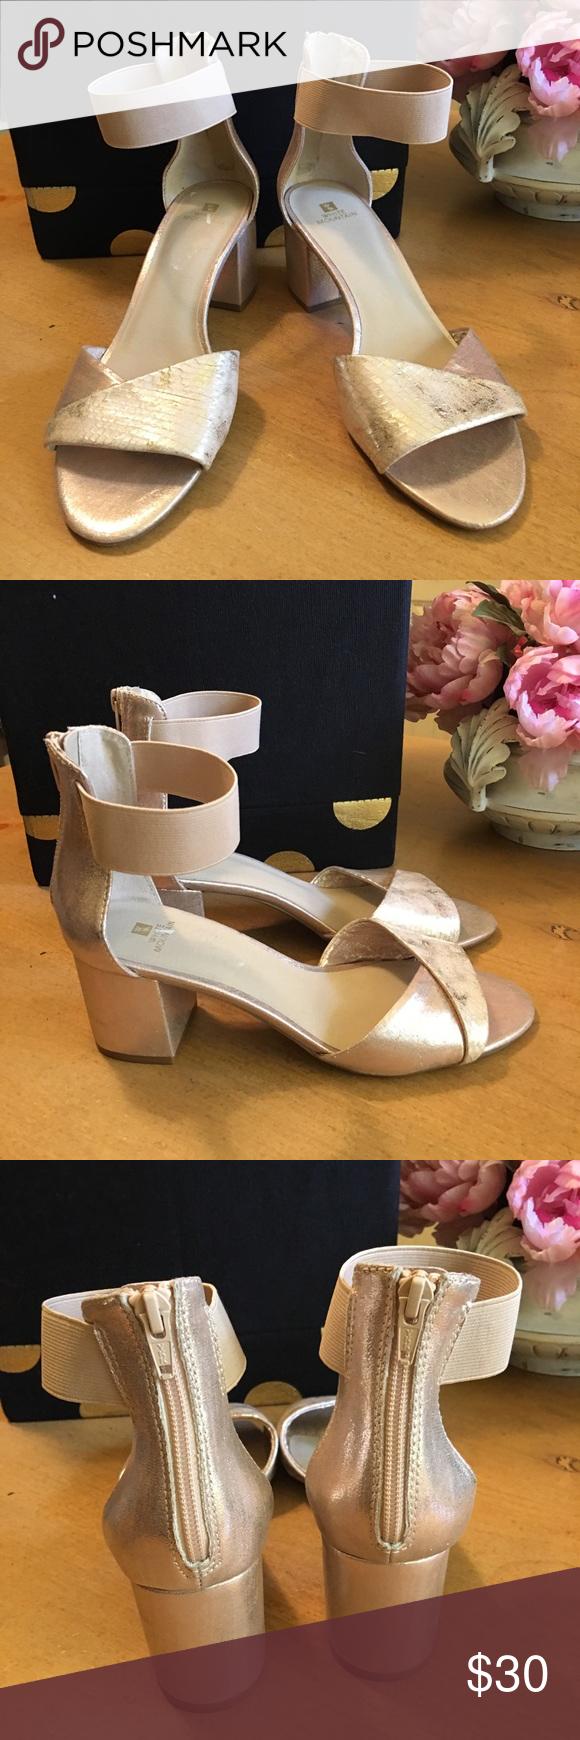 White Mountain Evie Gold Sandals 8.5 M